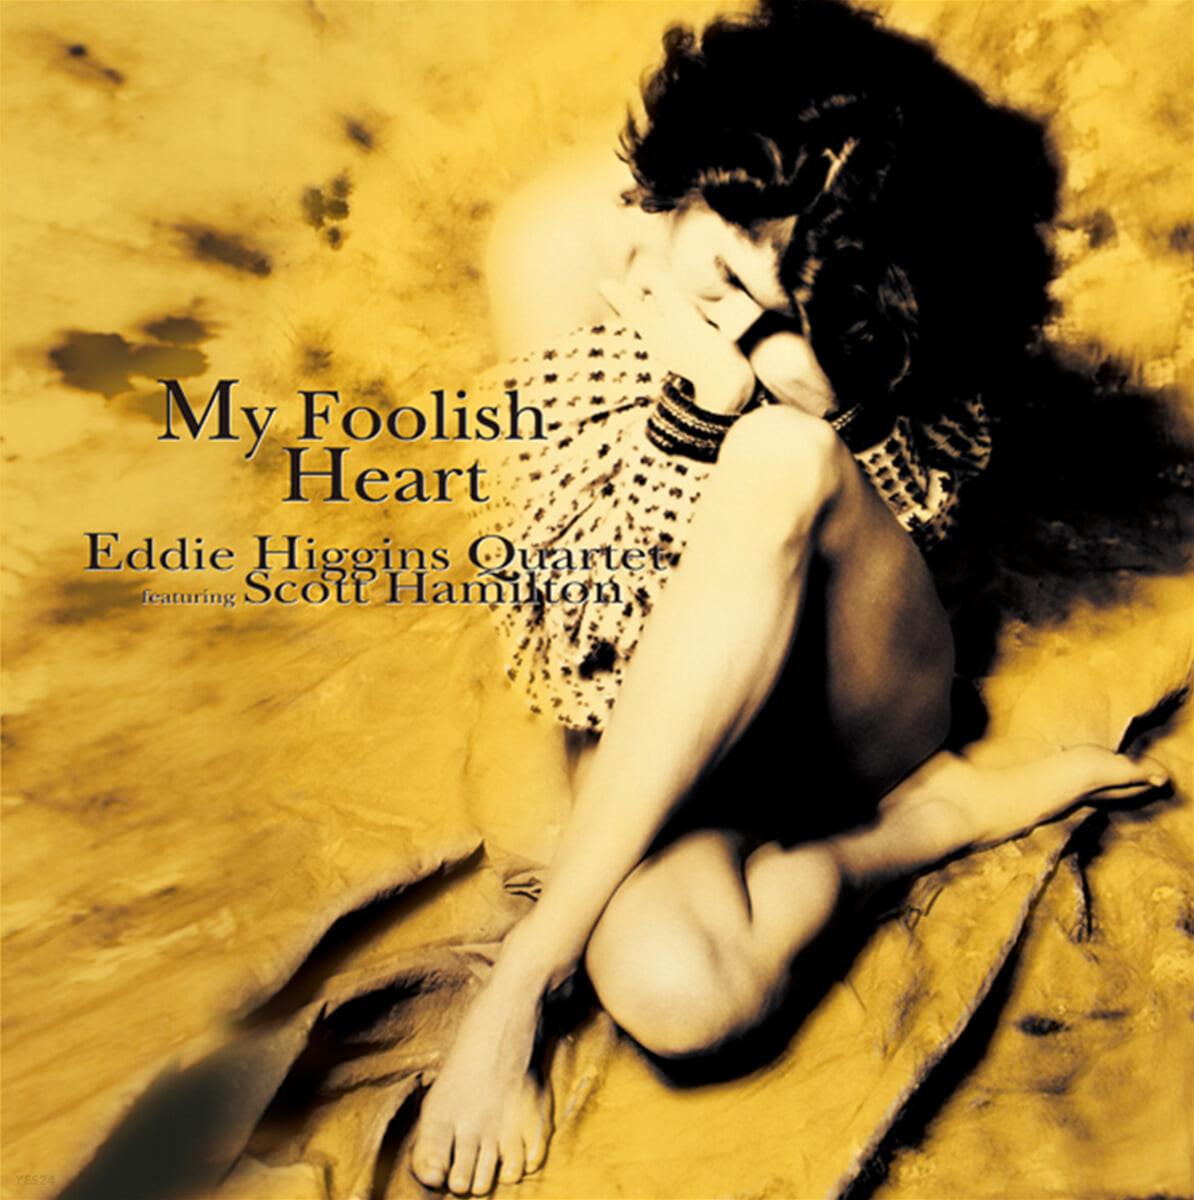 Eddie Higgins Quartet (에디 히긴스 쿼텟) - My Foolish Heart [LP]